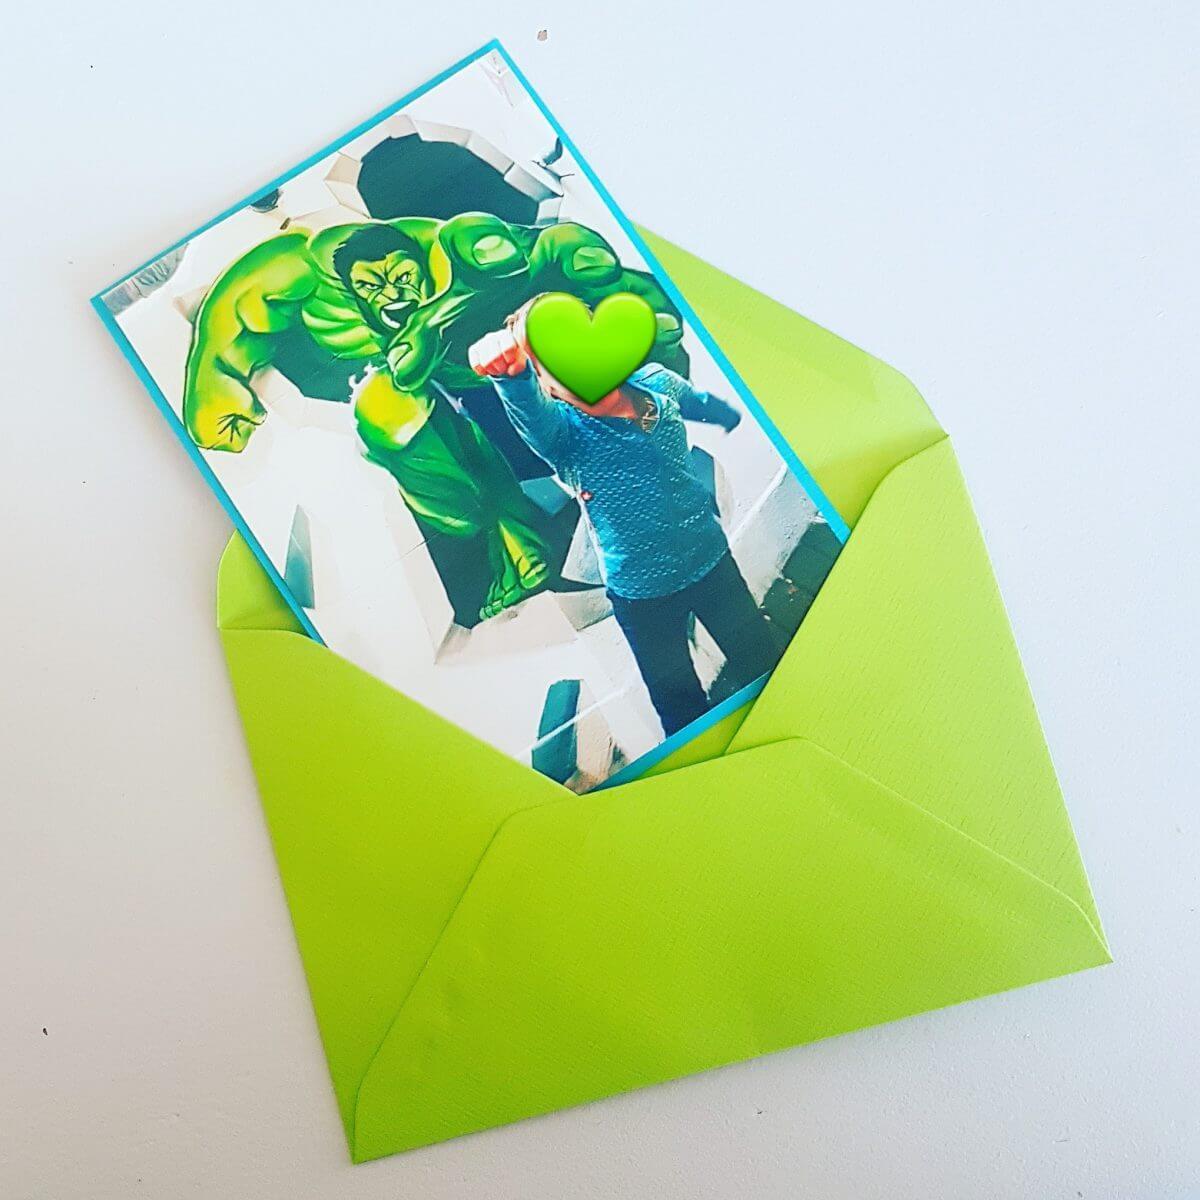 verjaardagsuitnodiging van de Hulk in Museum of Amsterdam Illusions